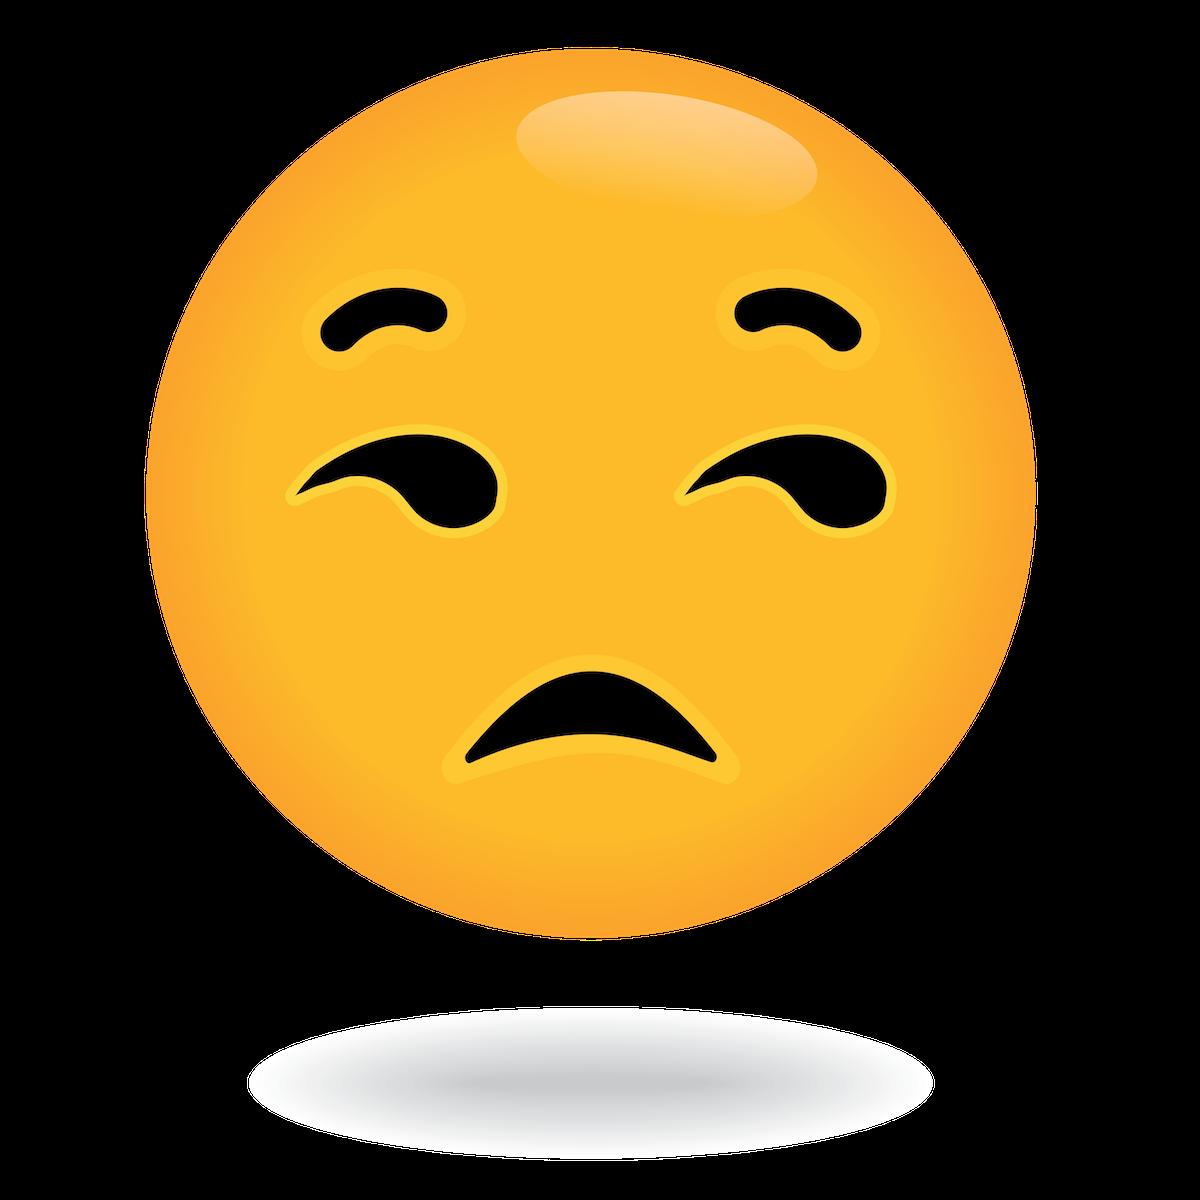 meh emoji by define awesome